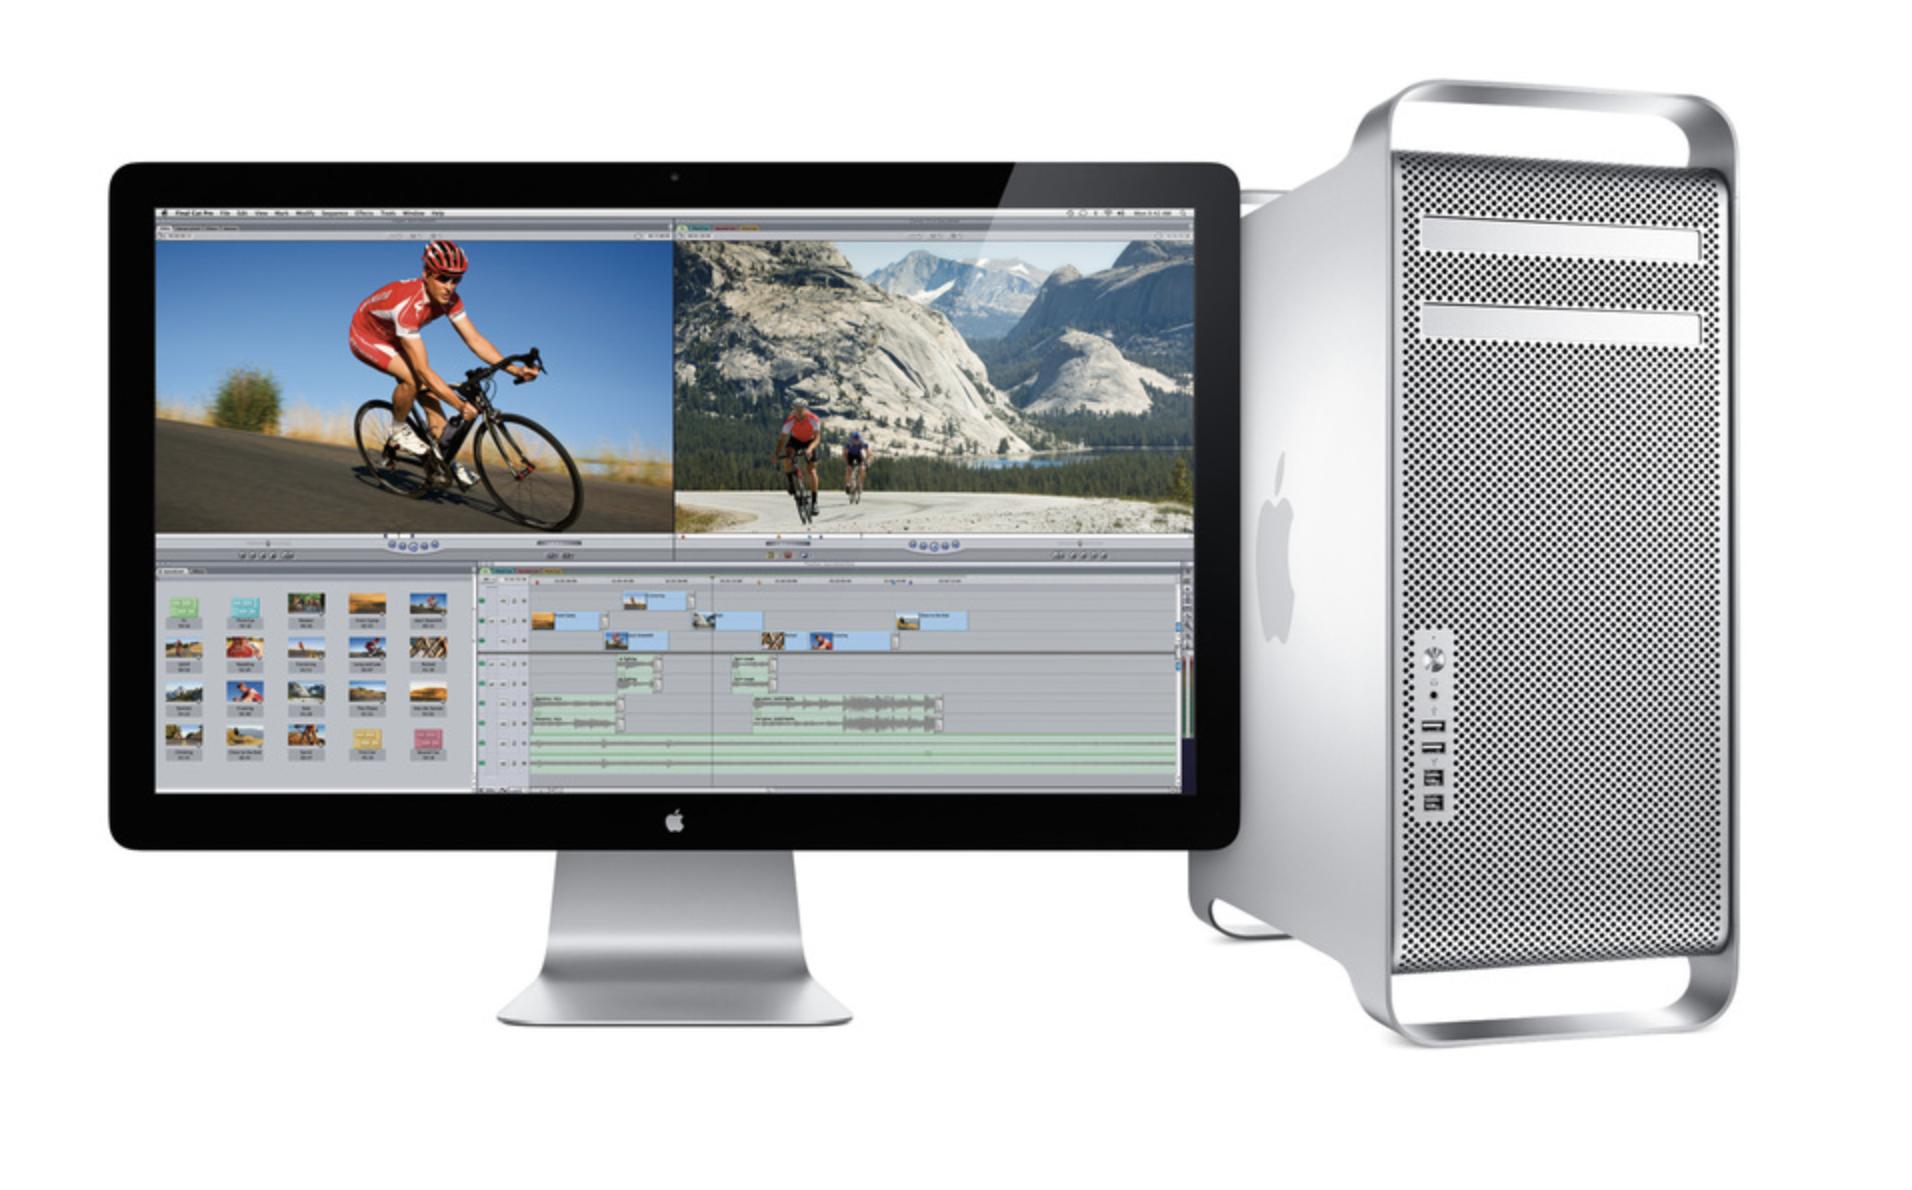 Alter Mac Pro: Apple nennt Mojave-kompatible Grafikkarten